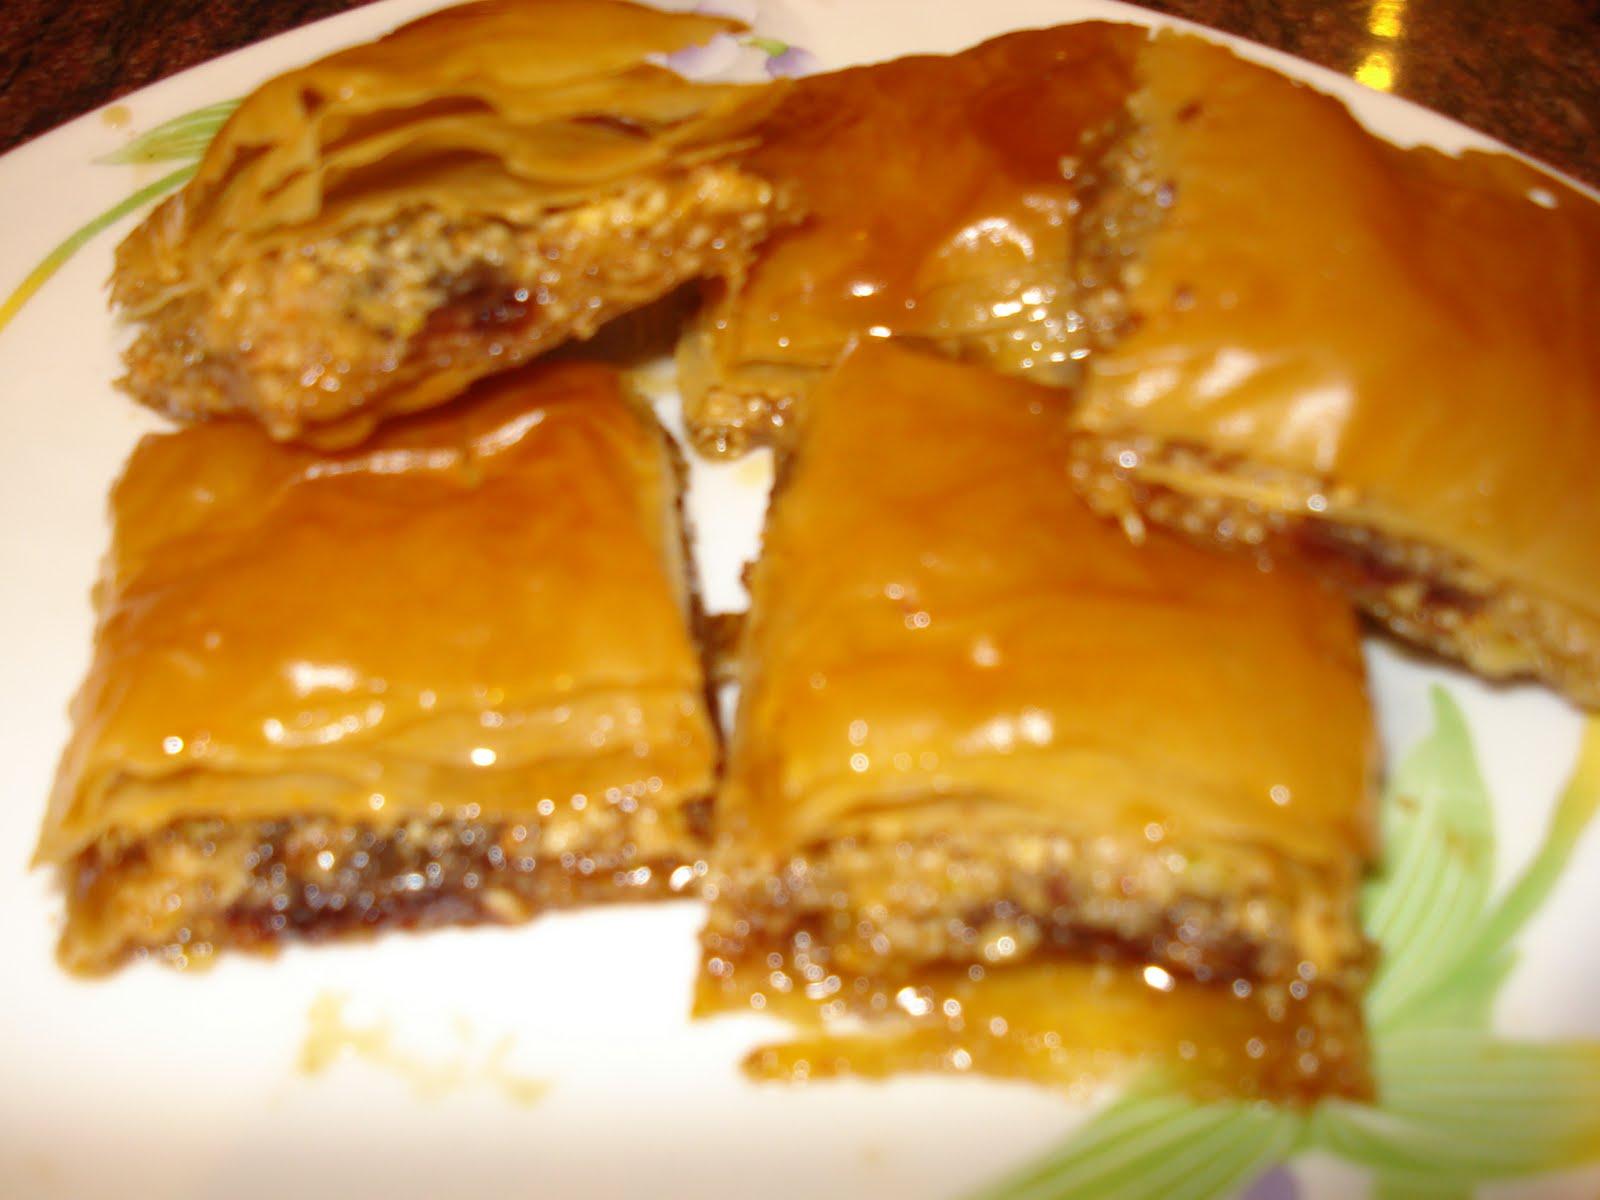 Bakllavat E Cekes 3.bp.blogspot.com